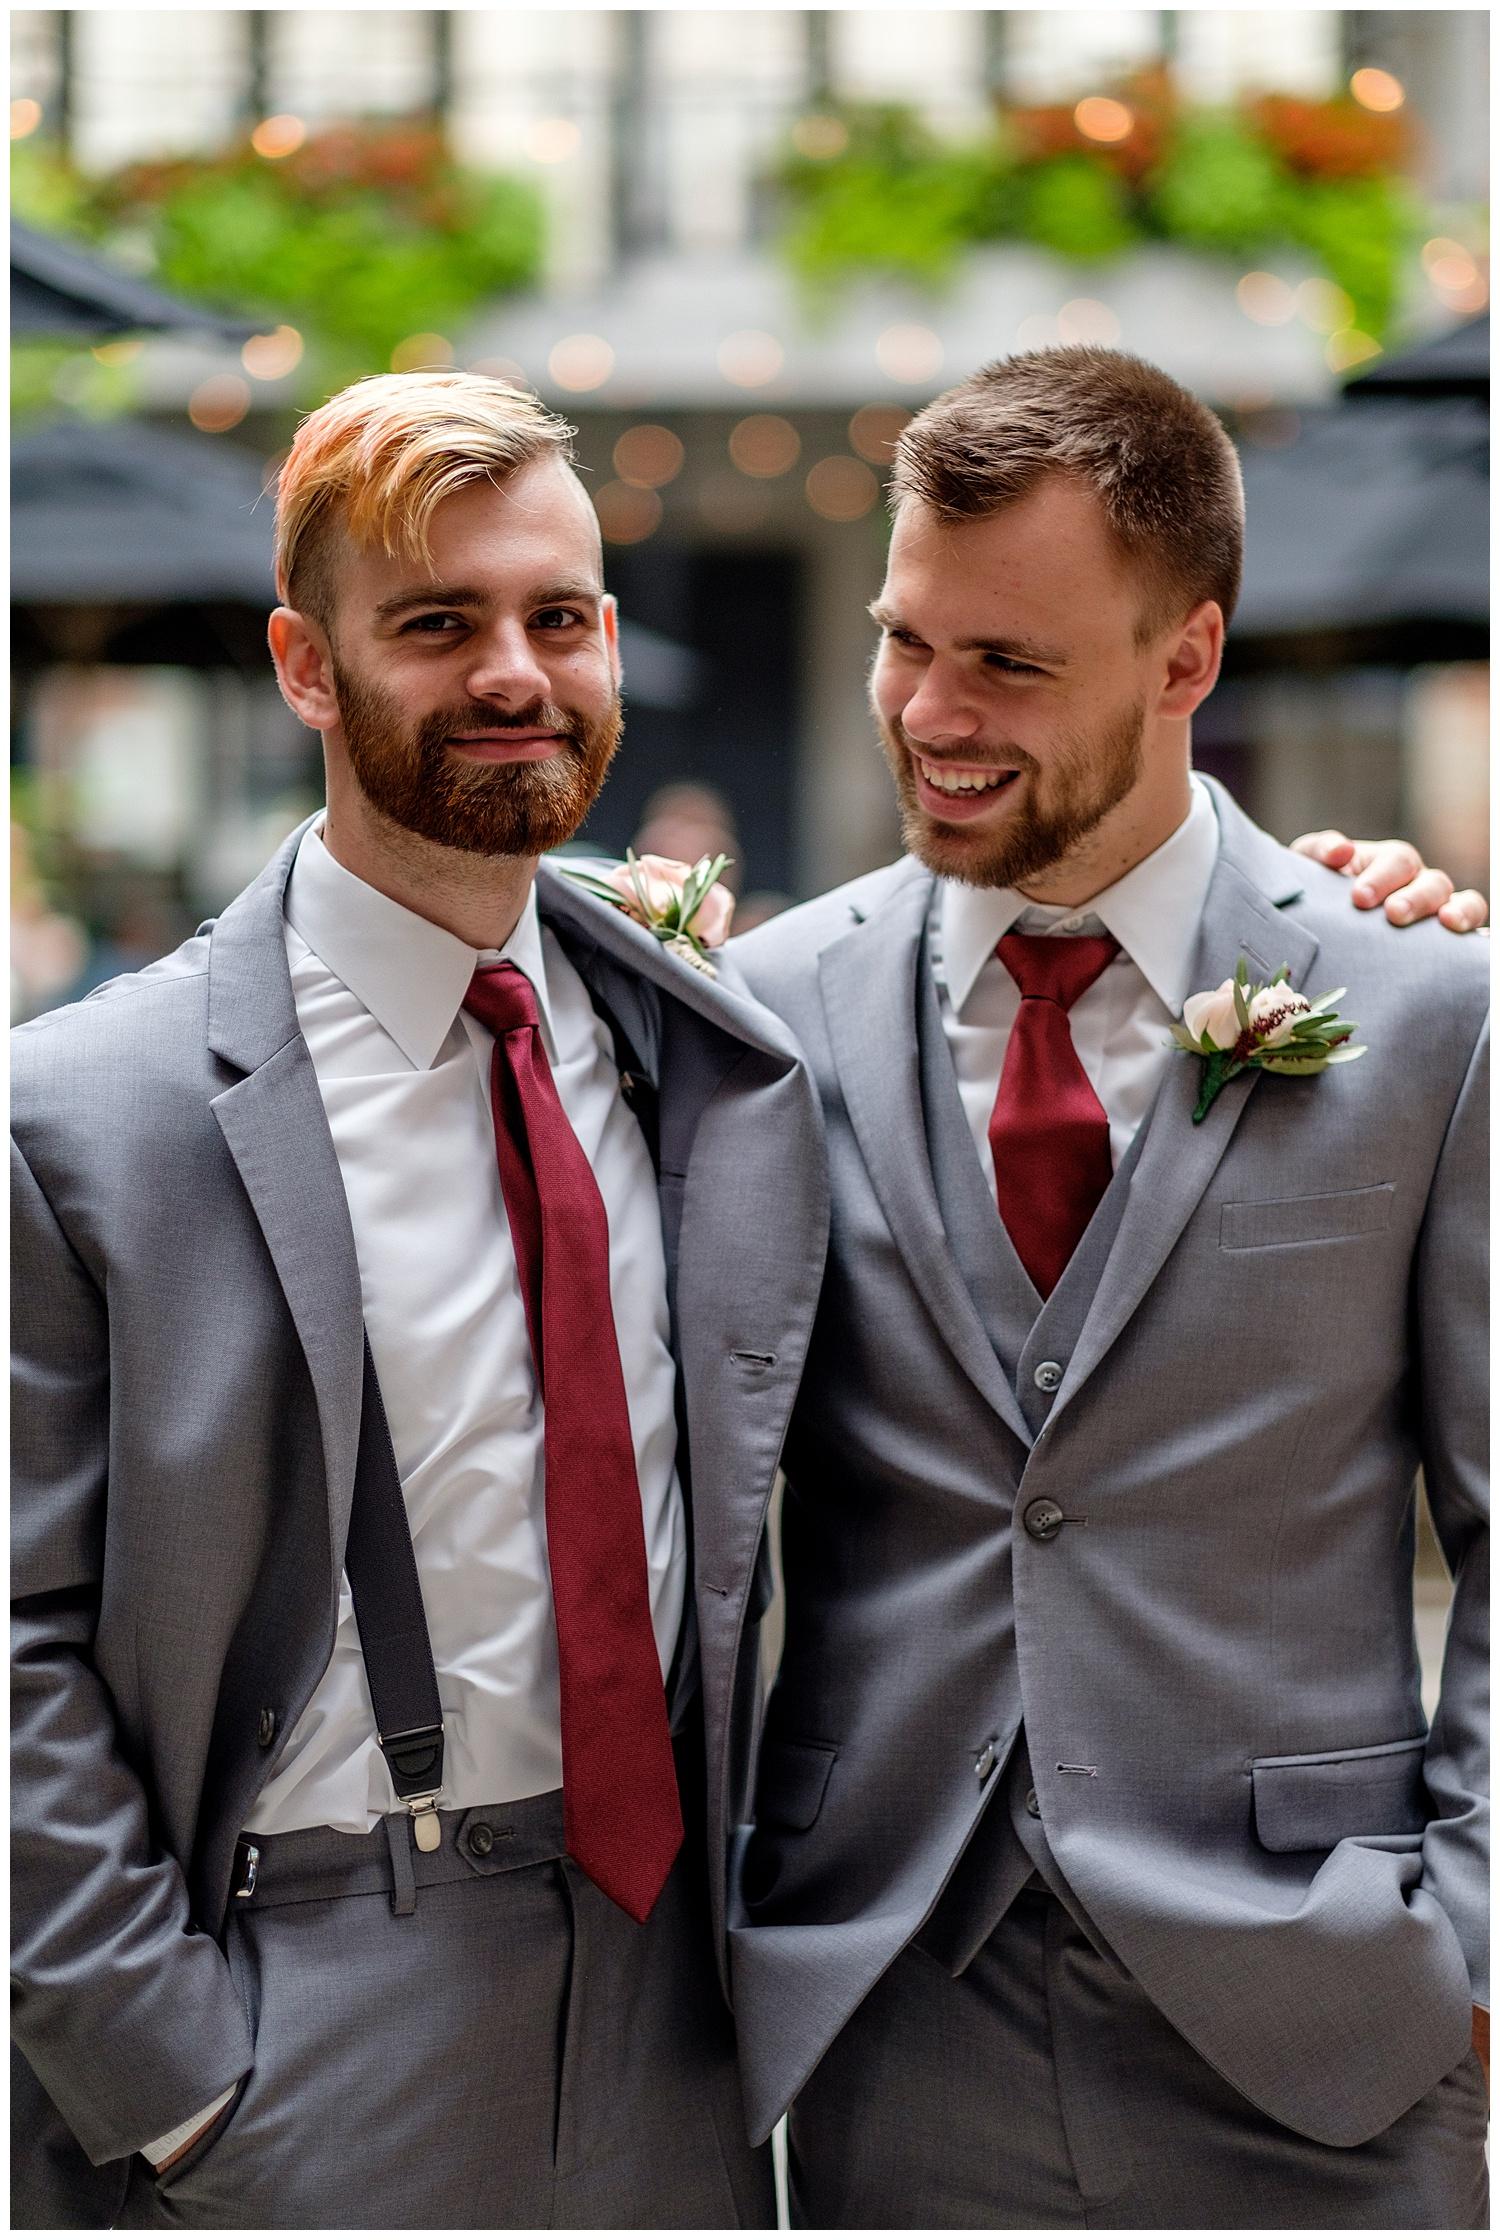 TheSmythCollective-Best-Cincinnati-Wedding-Photographer-Urban-Downtown-Covington-Wedding-17.jpg